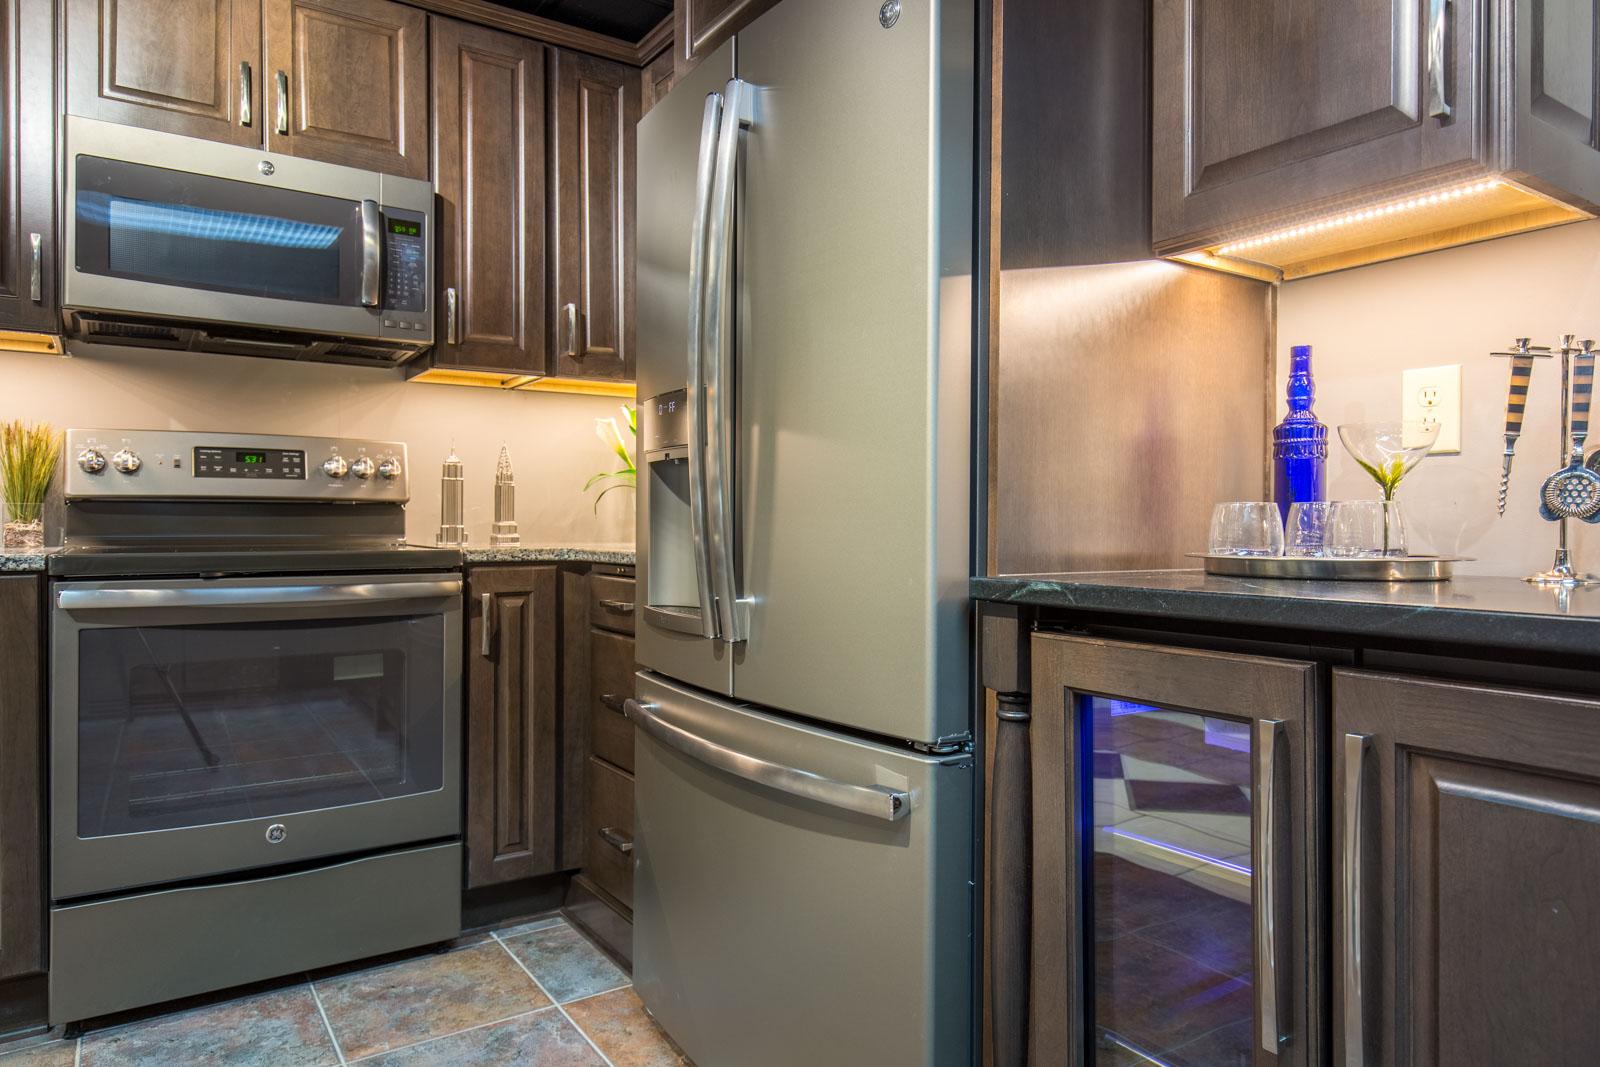 Shop Kitchen Appliances | ALL, Inc. Appliance Showroom - St ...